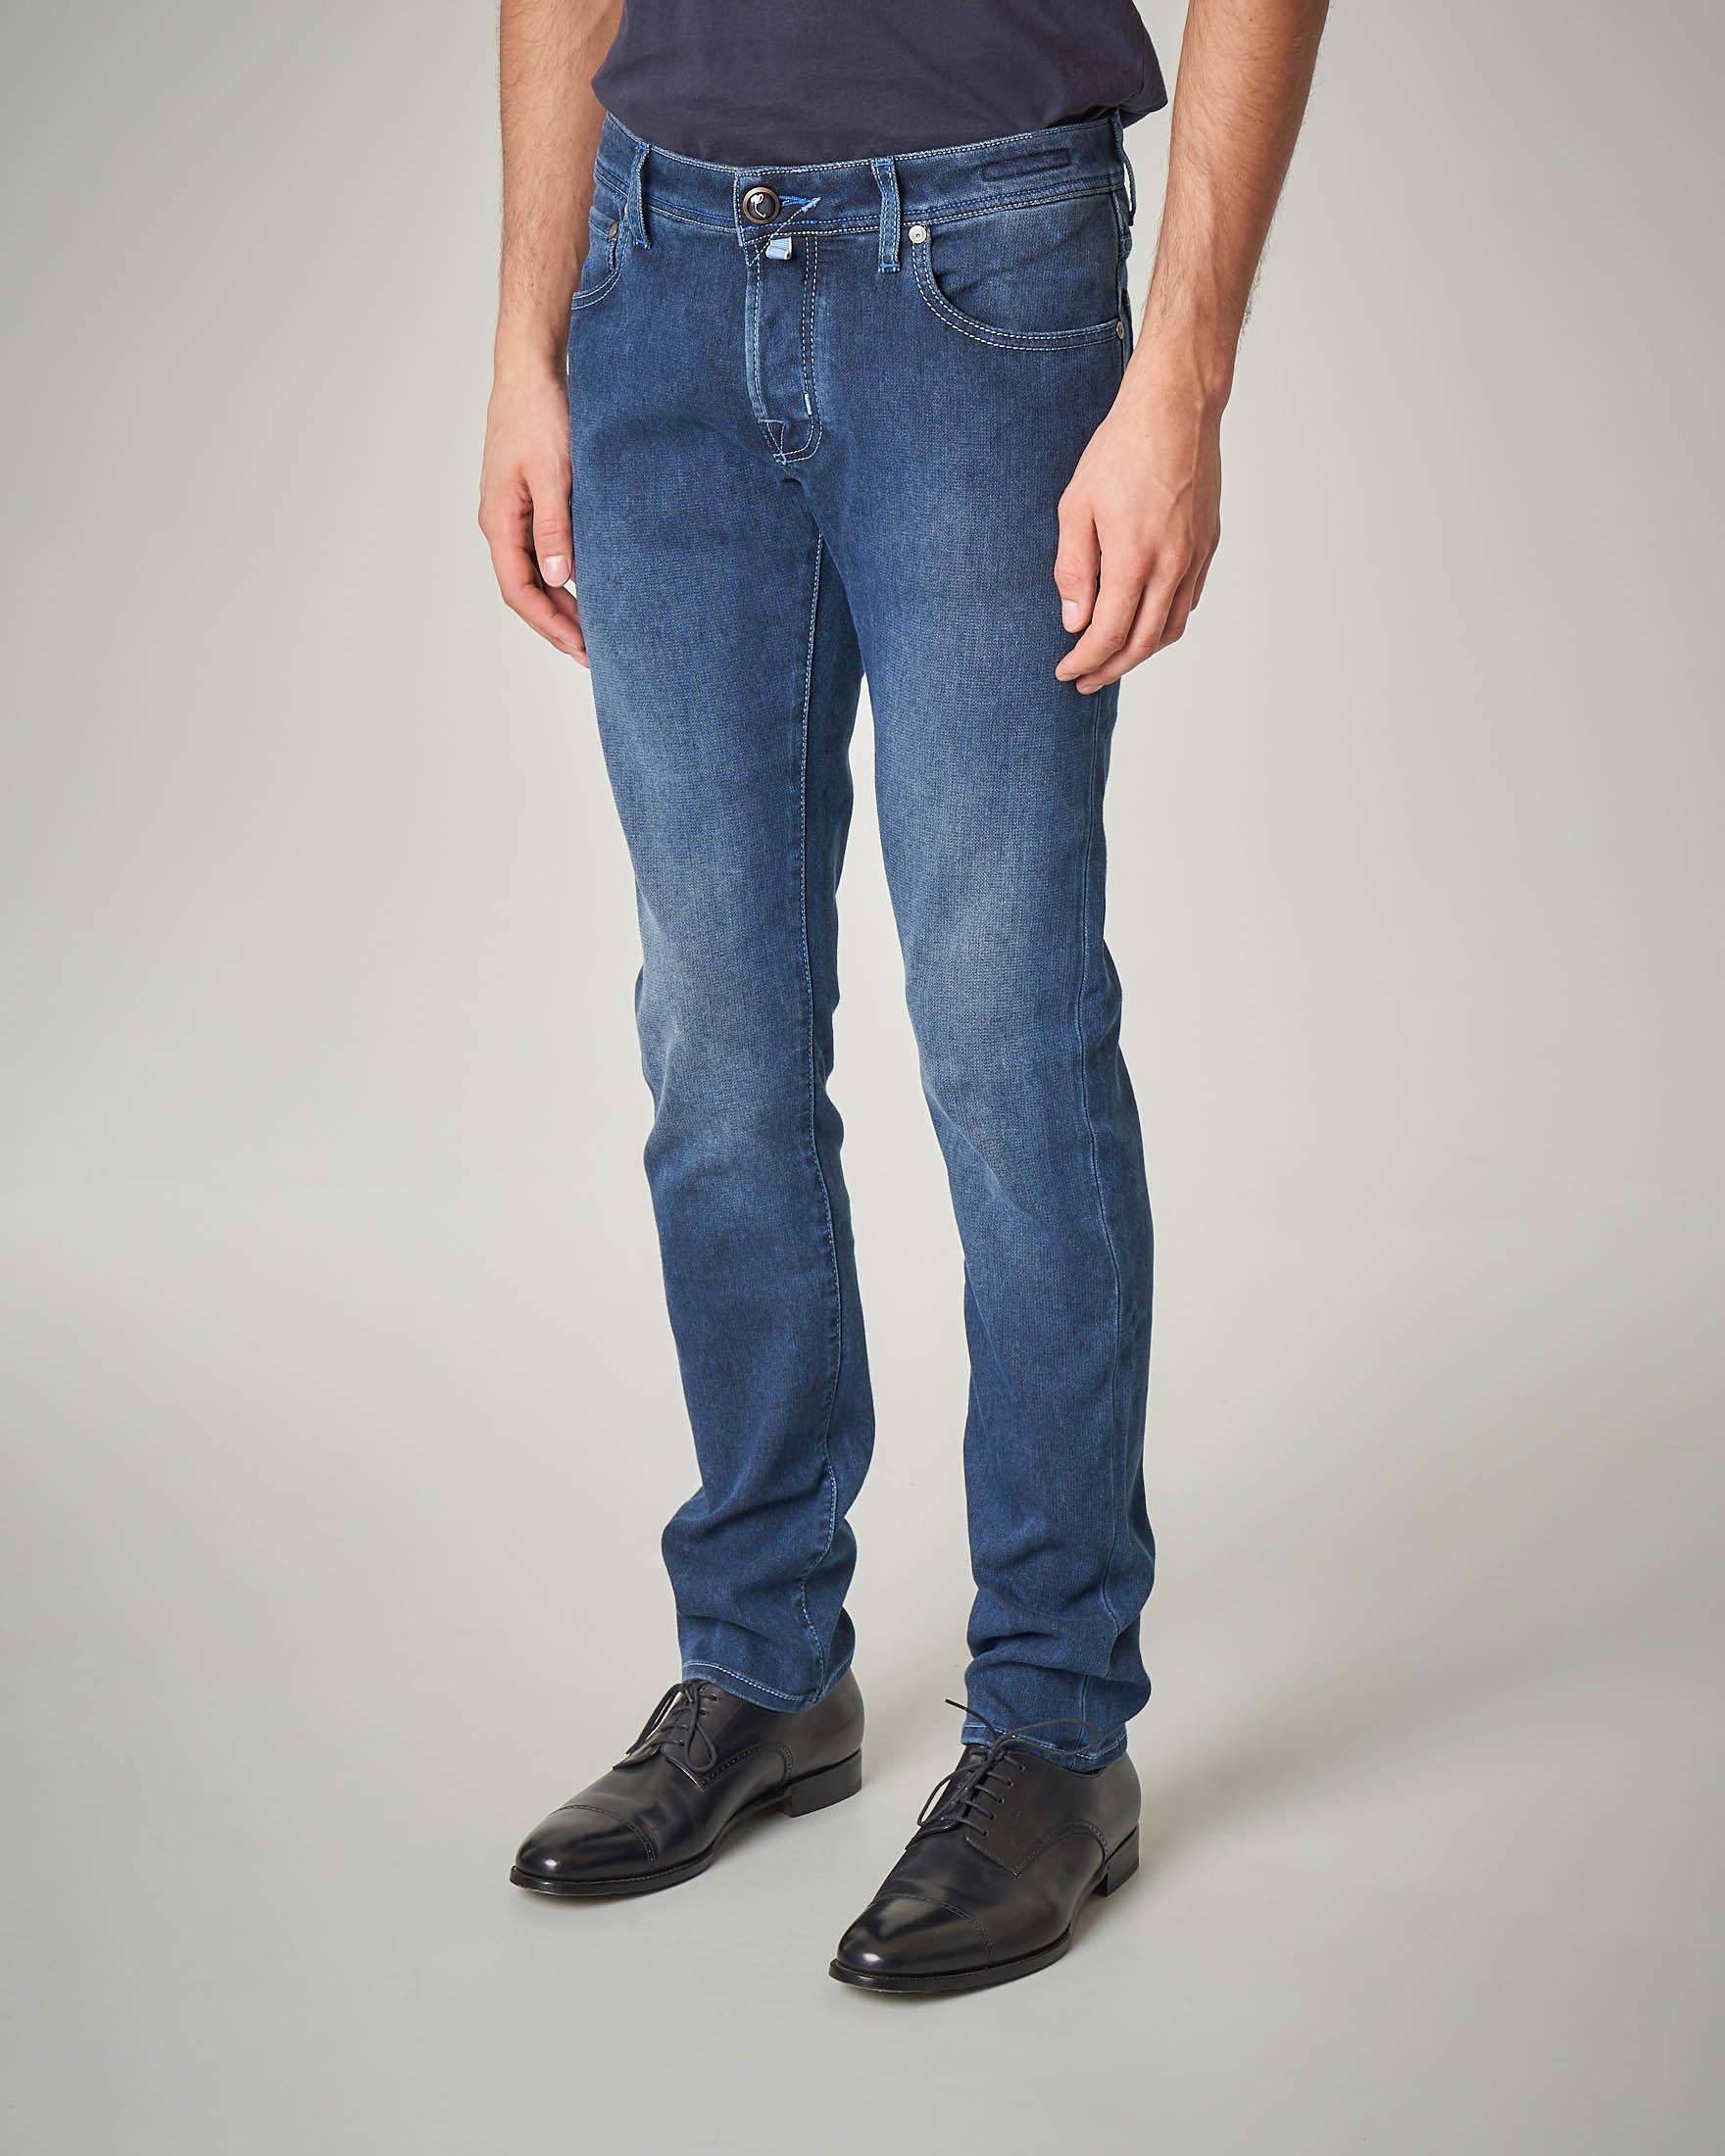 Jeans lavaggio indaco